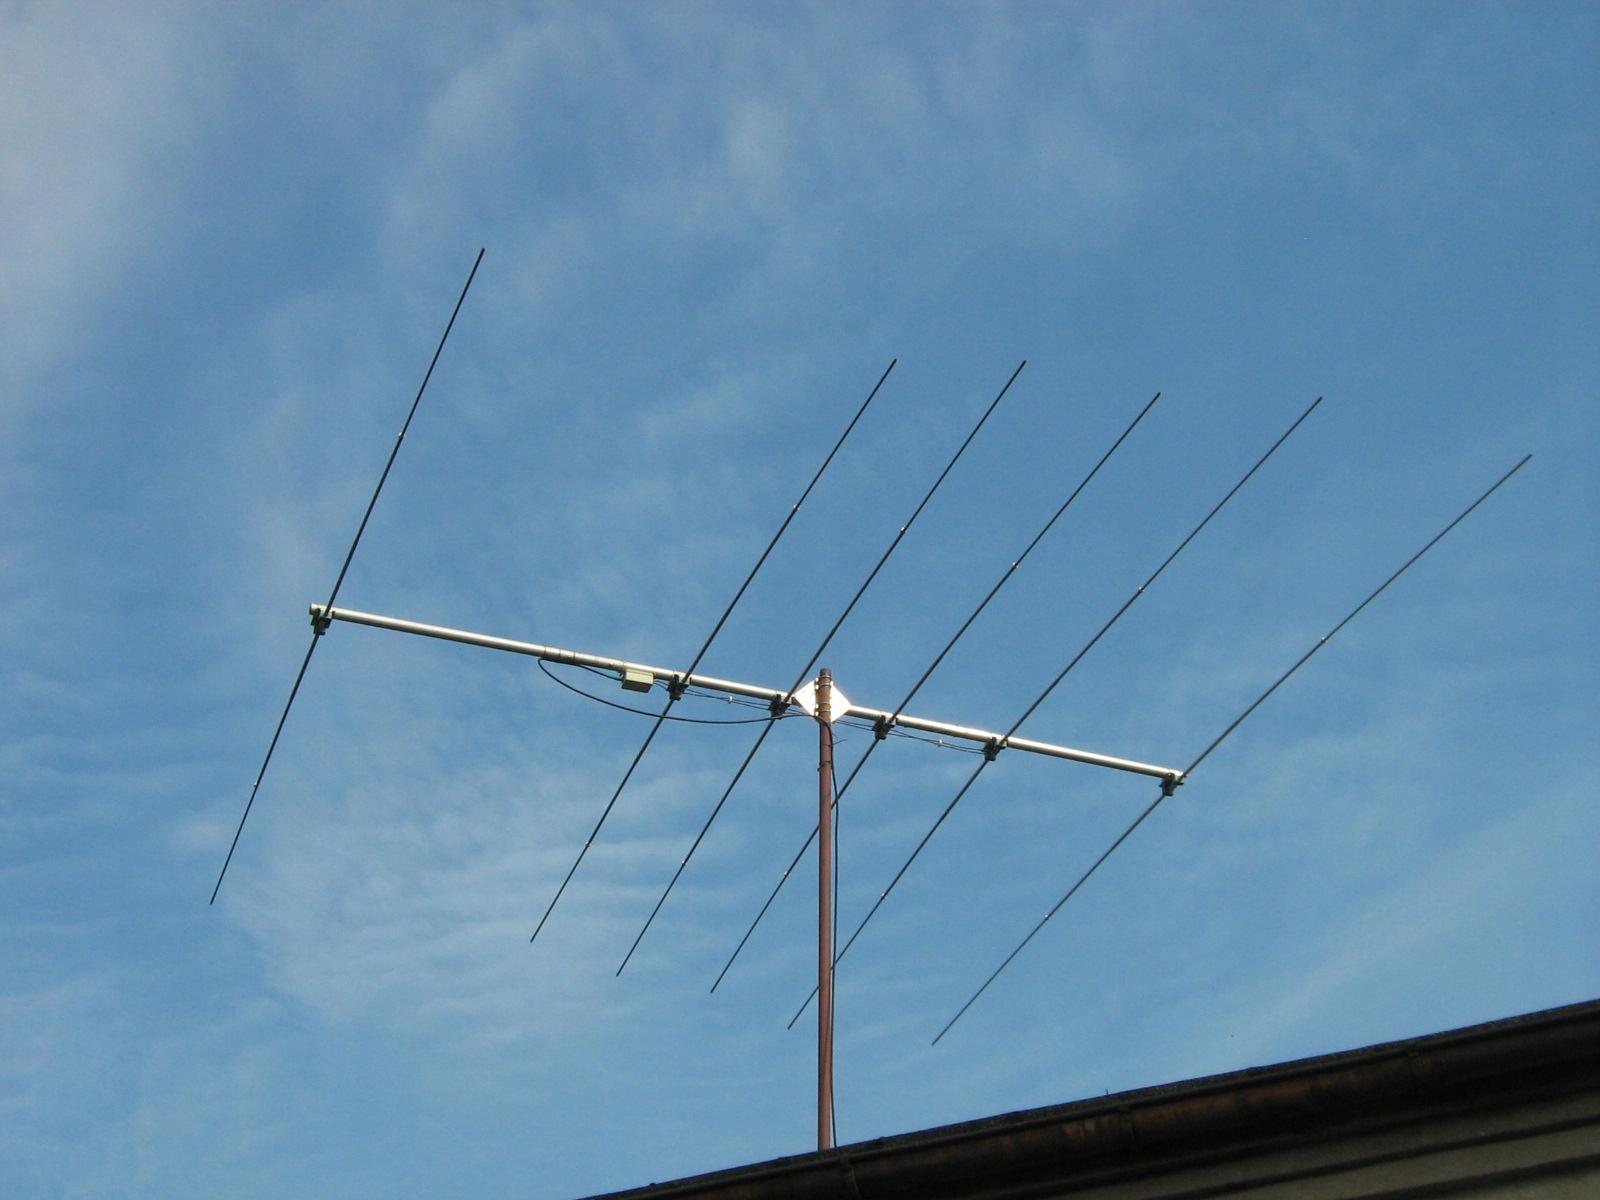 Antena Yaga